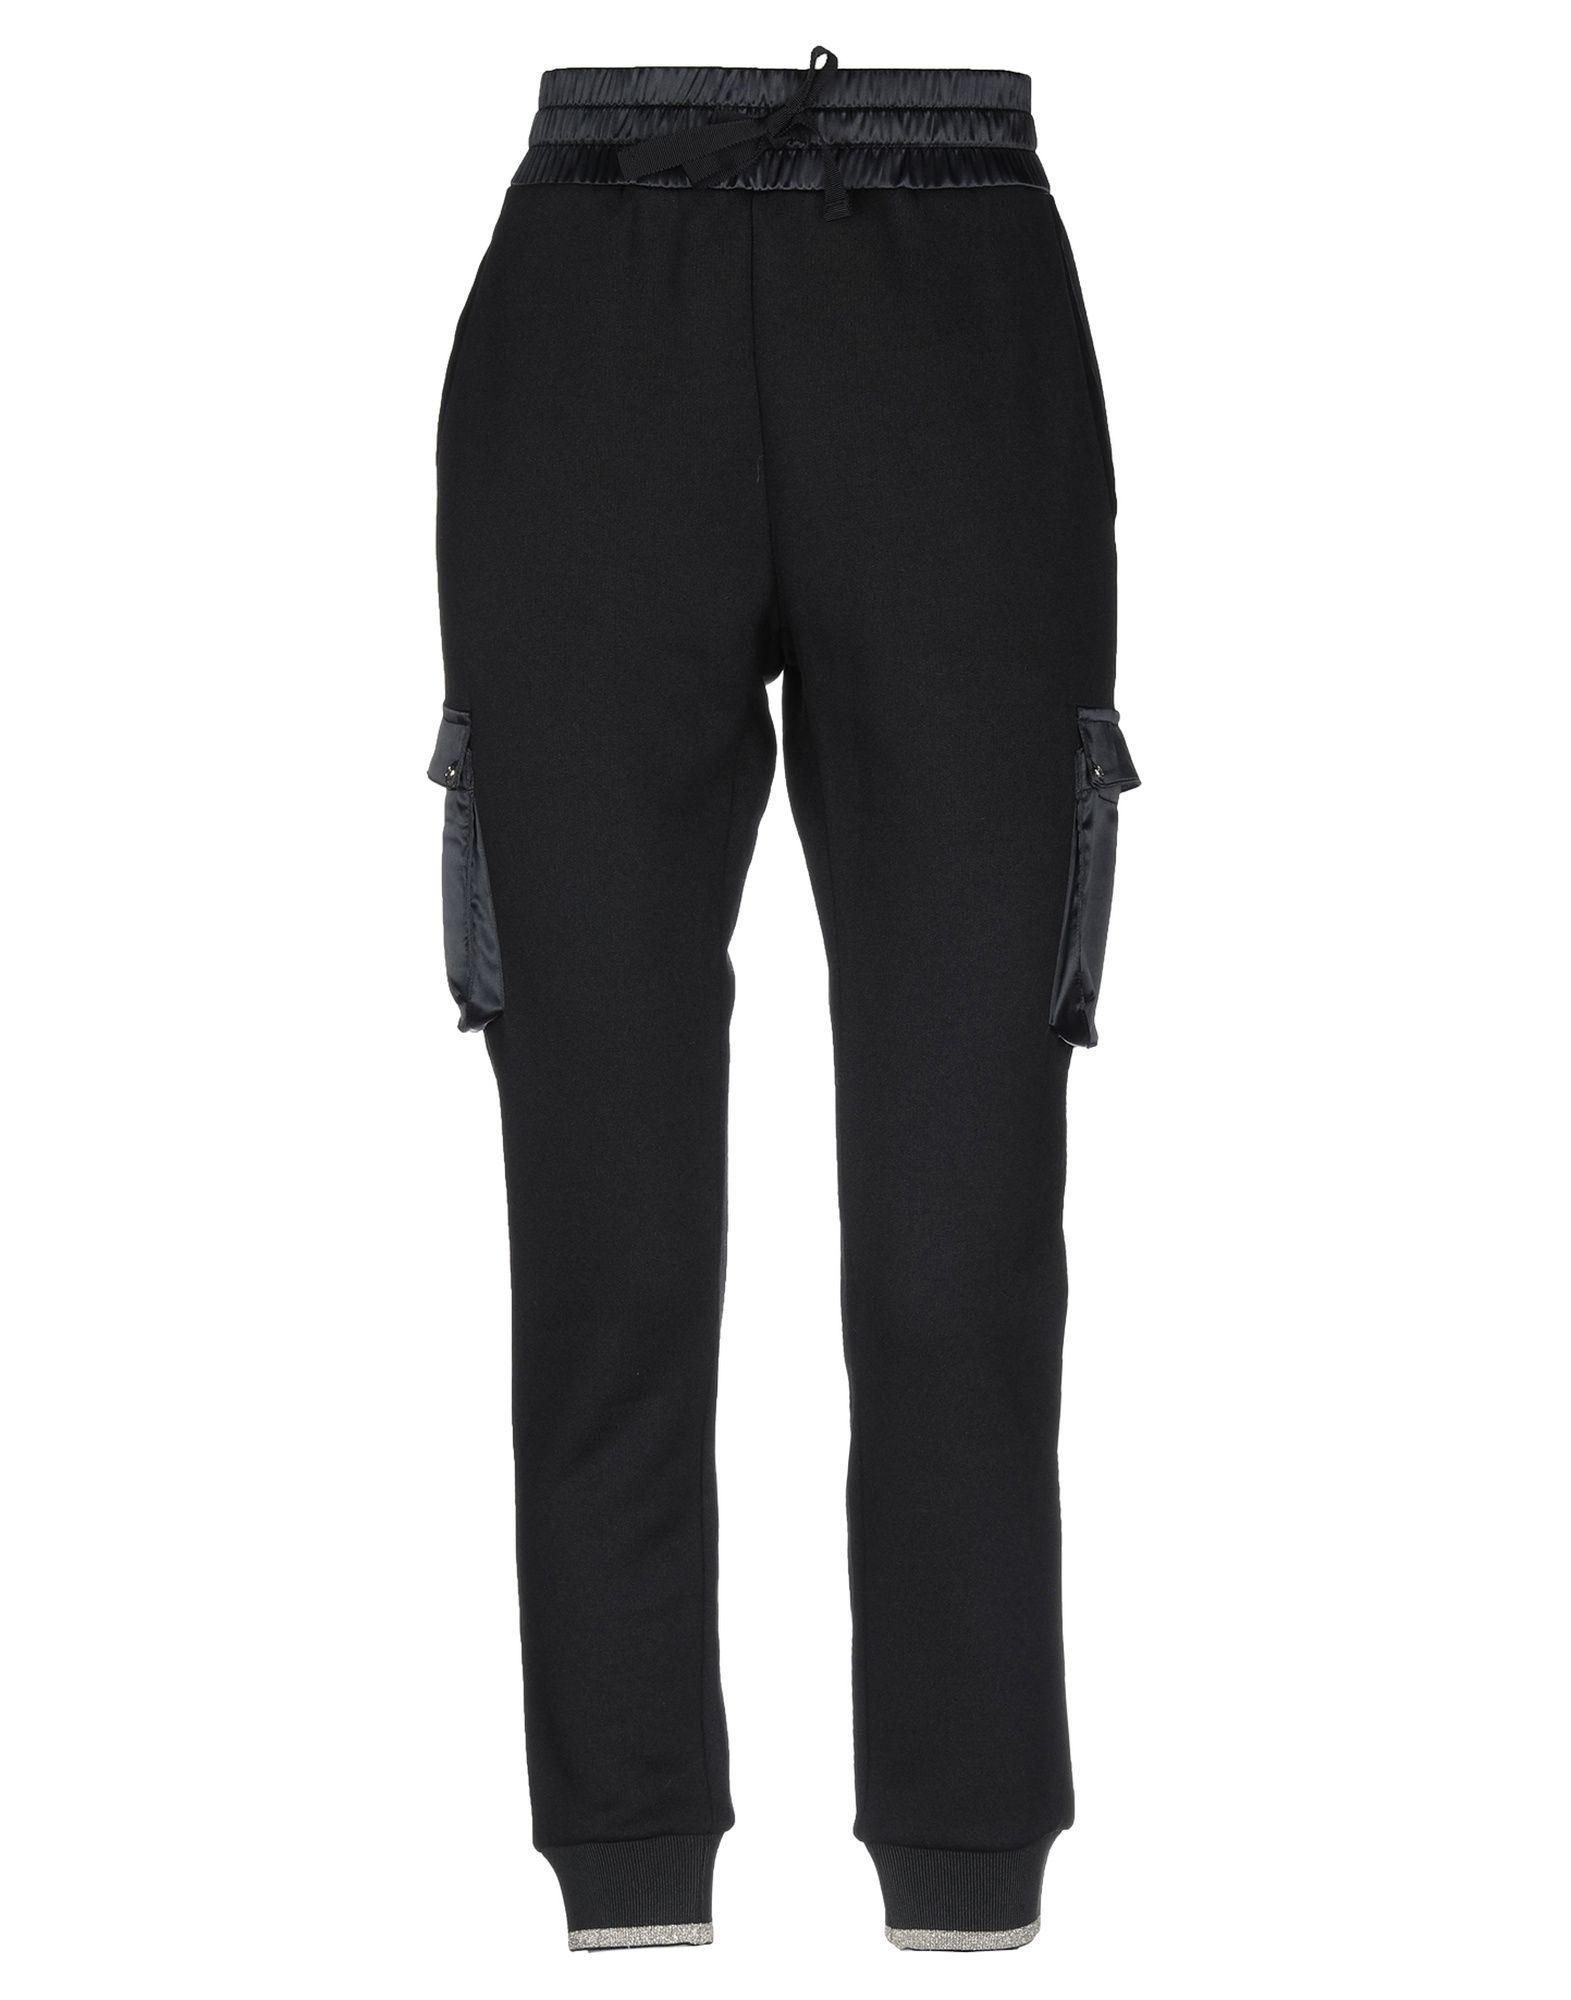 Pantalone Pantalone Pantalone Patrizia Pepe donna - 13254157GE 108